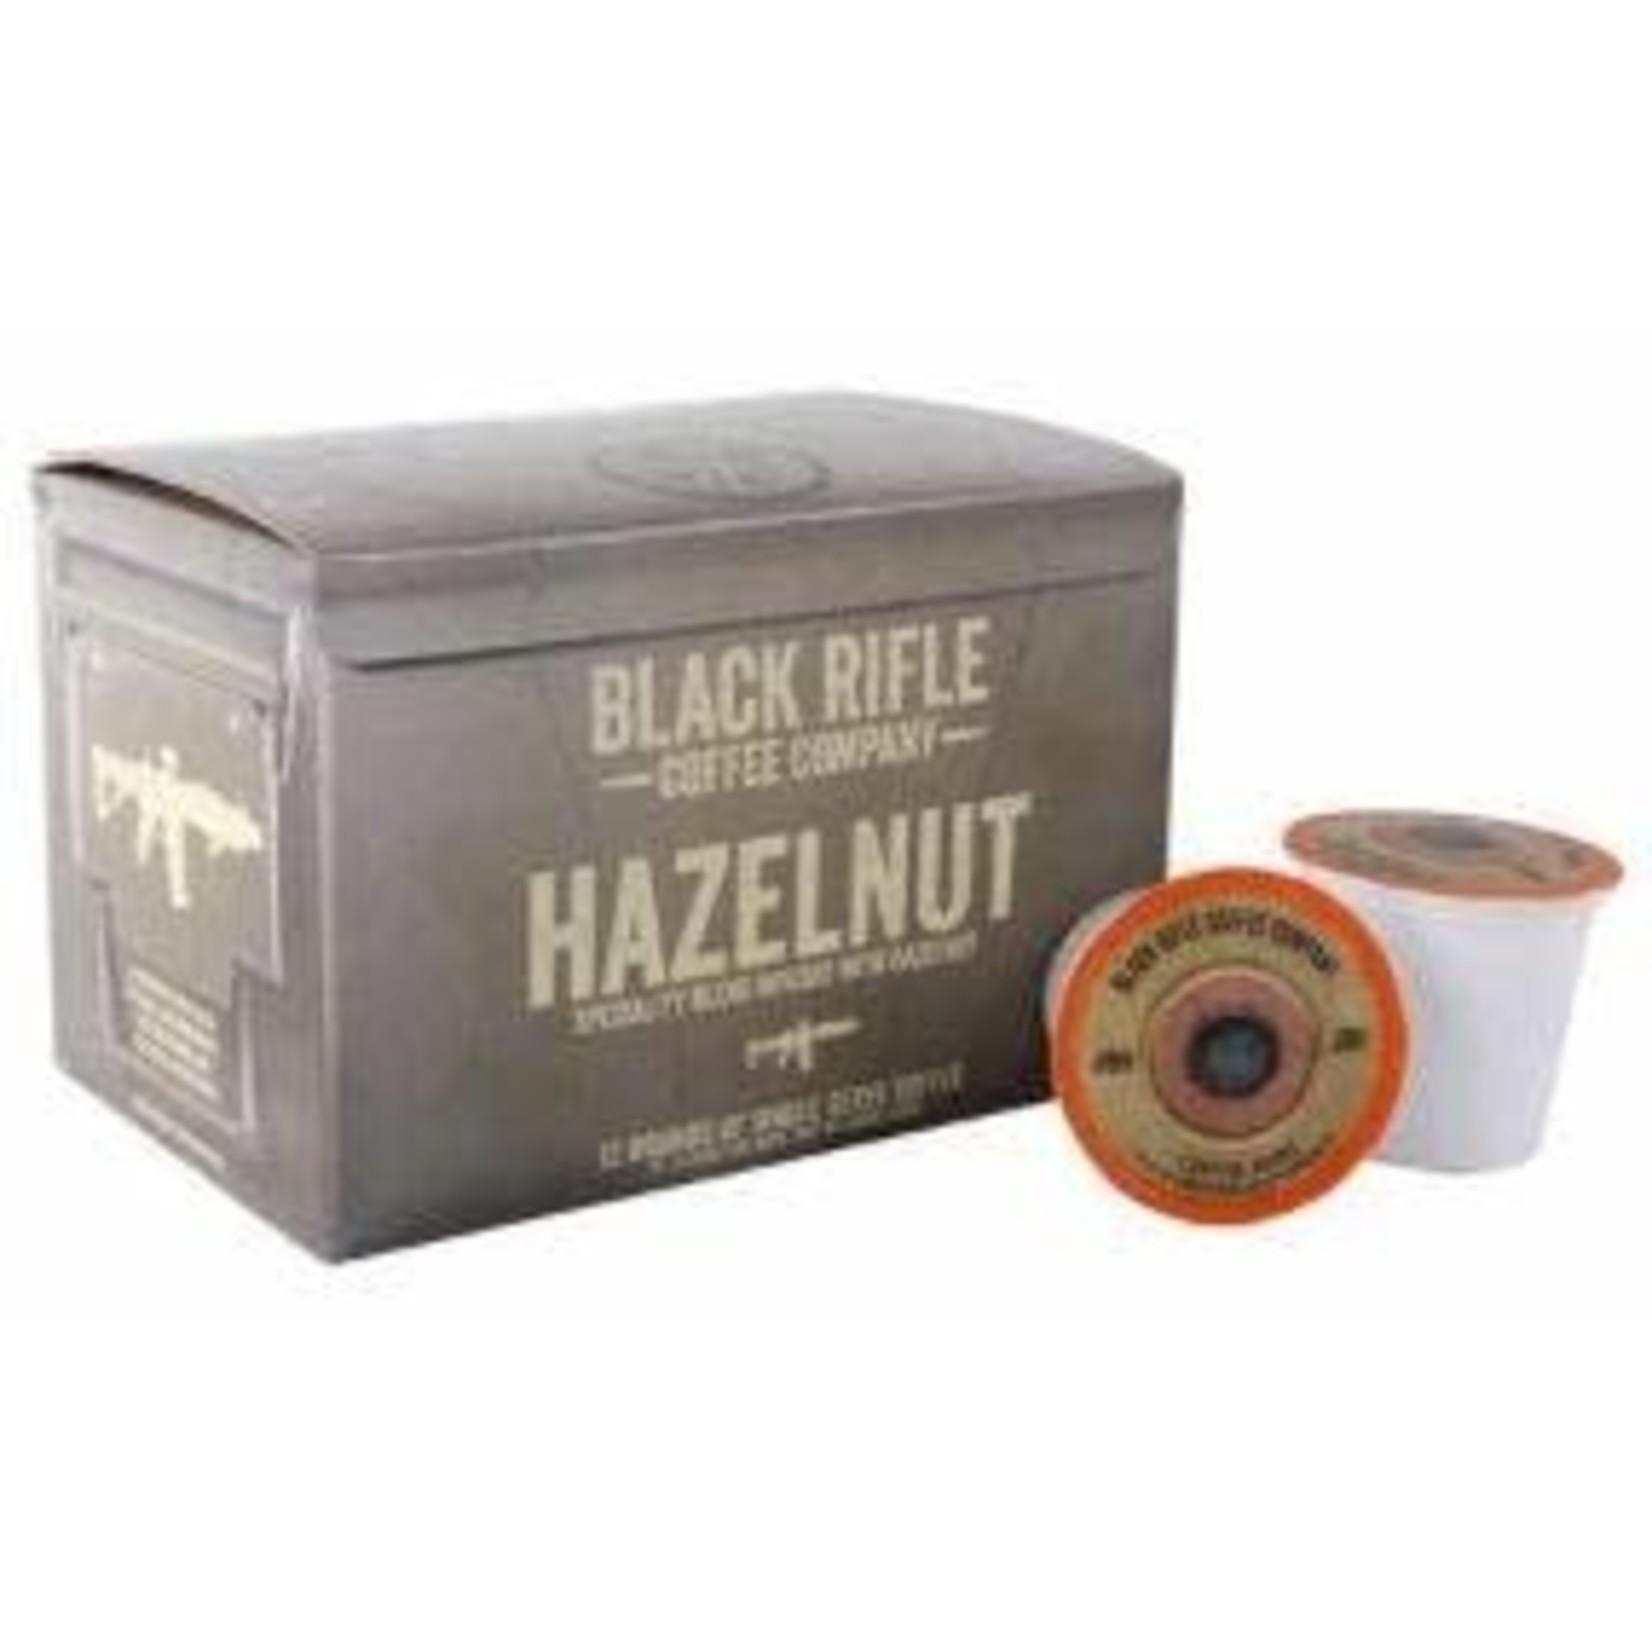 Black Rifle Coffee Black Rifle Hazelnut Coffee Rounds